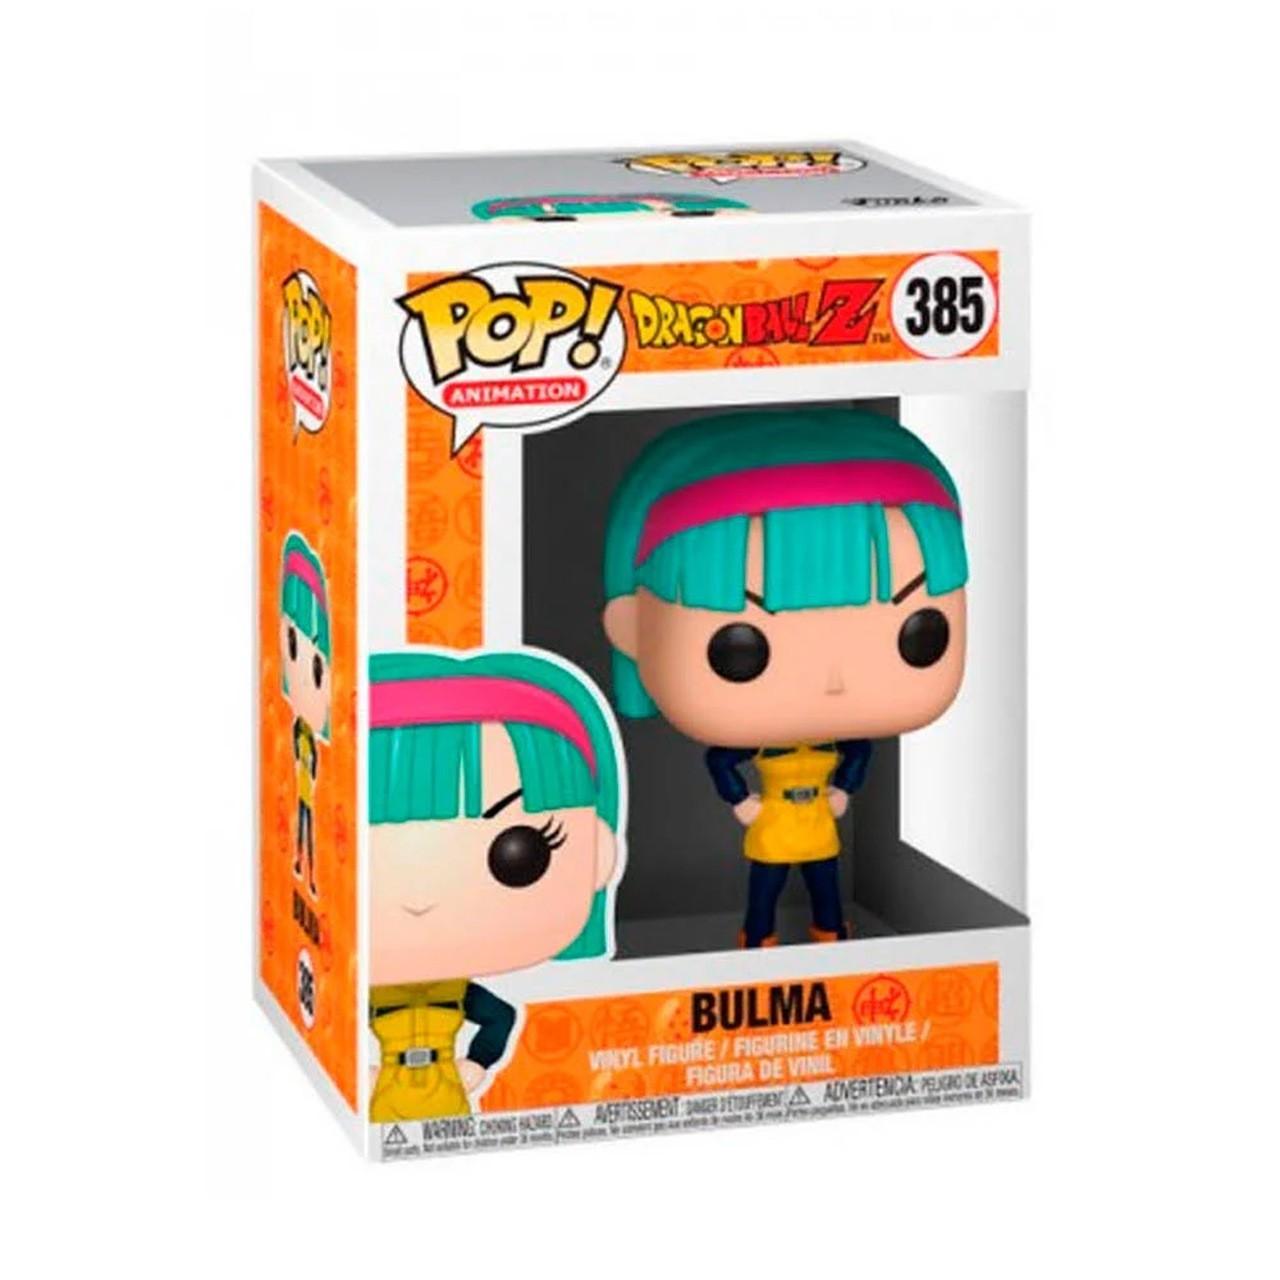 Boneco Funko Pop - Bulma 385 - Dragon Ball Z - Original